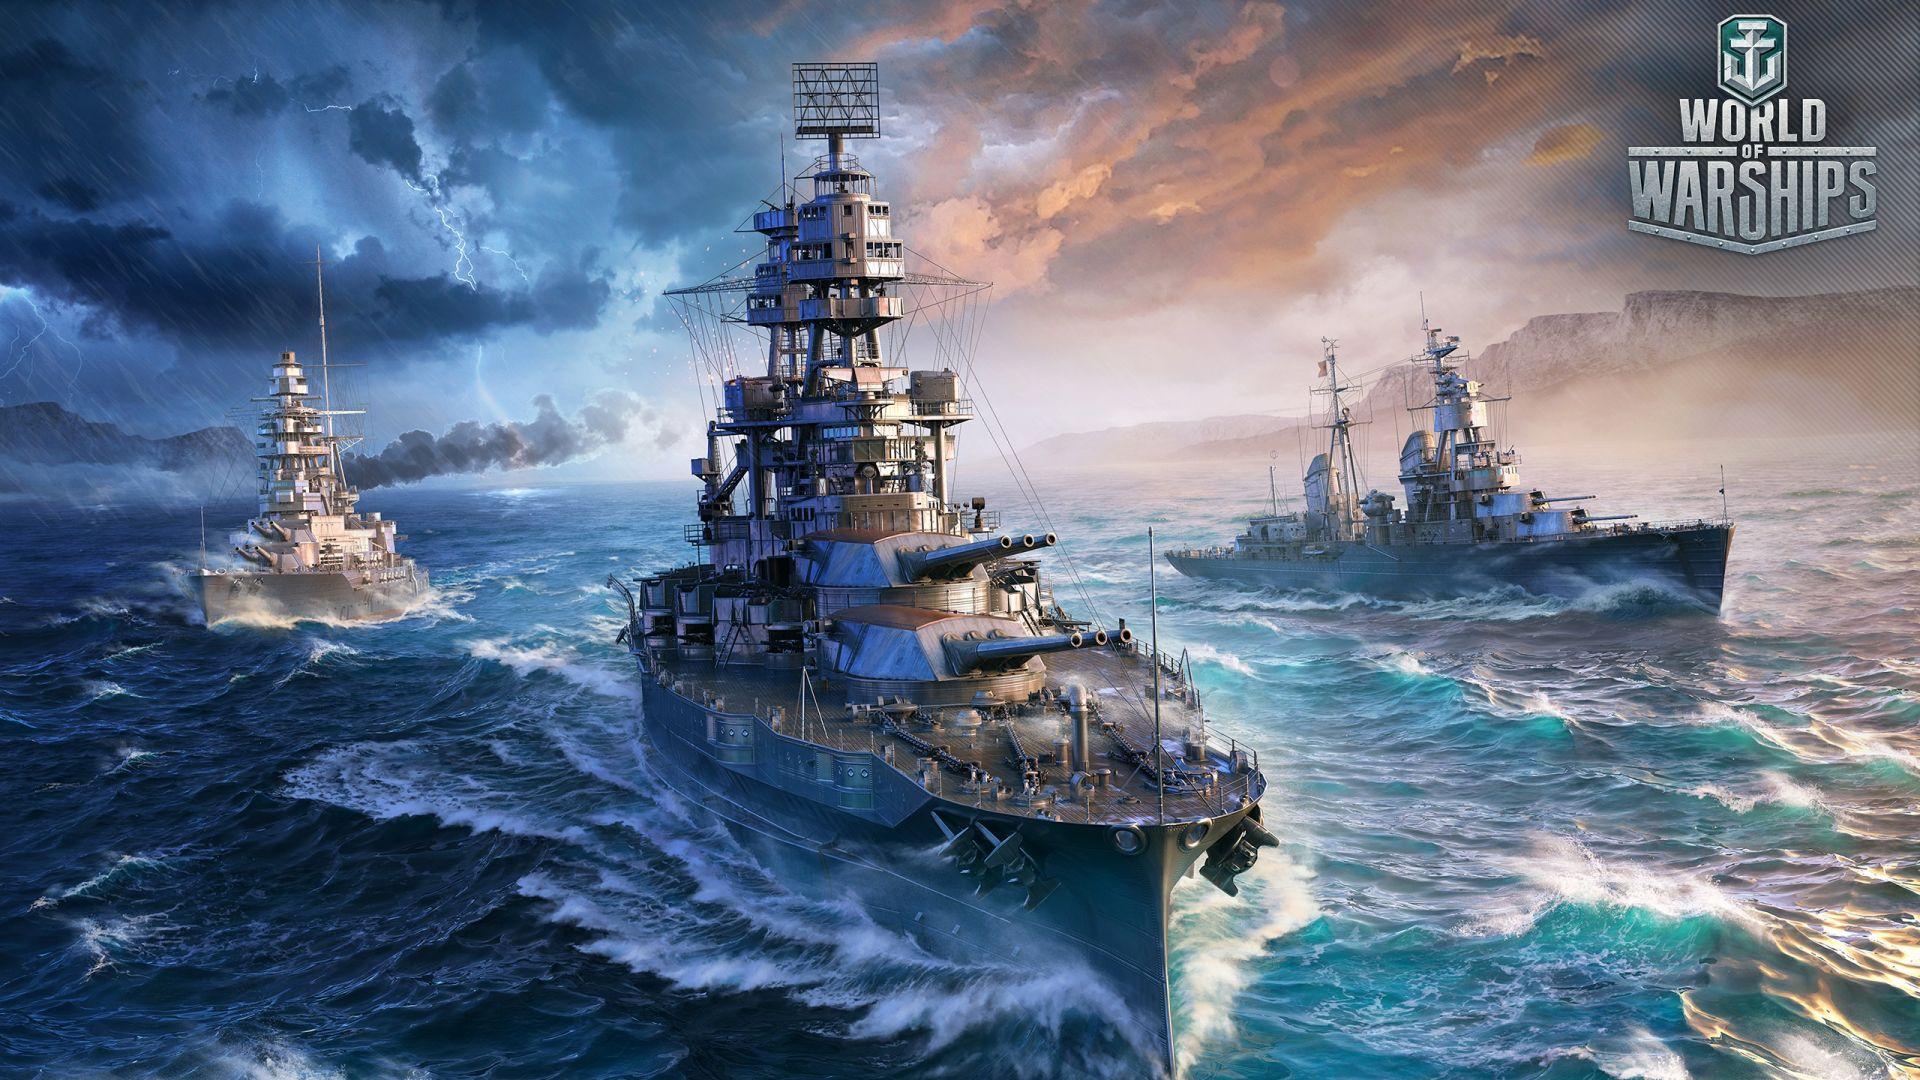 Wallpaper World of Warships, 2017 online game, ships